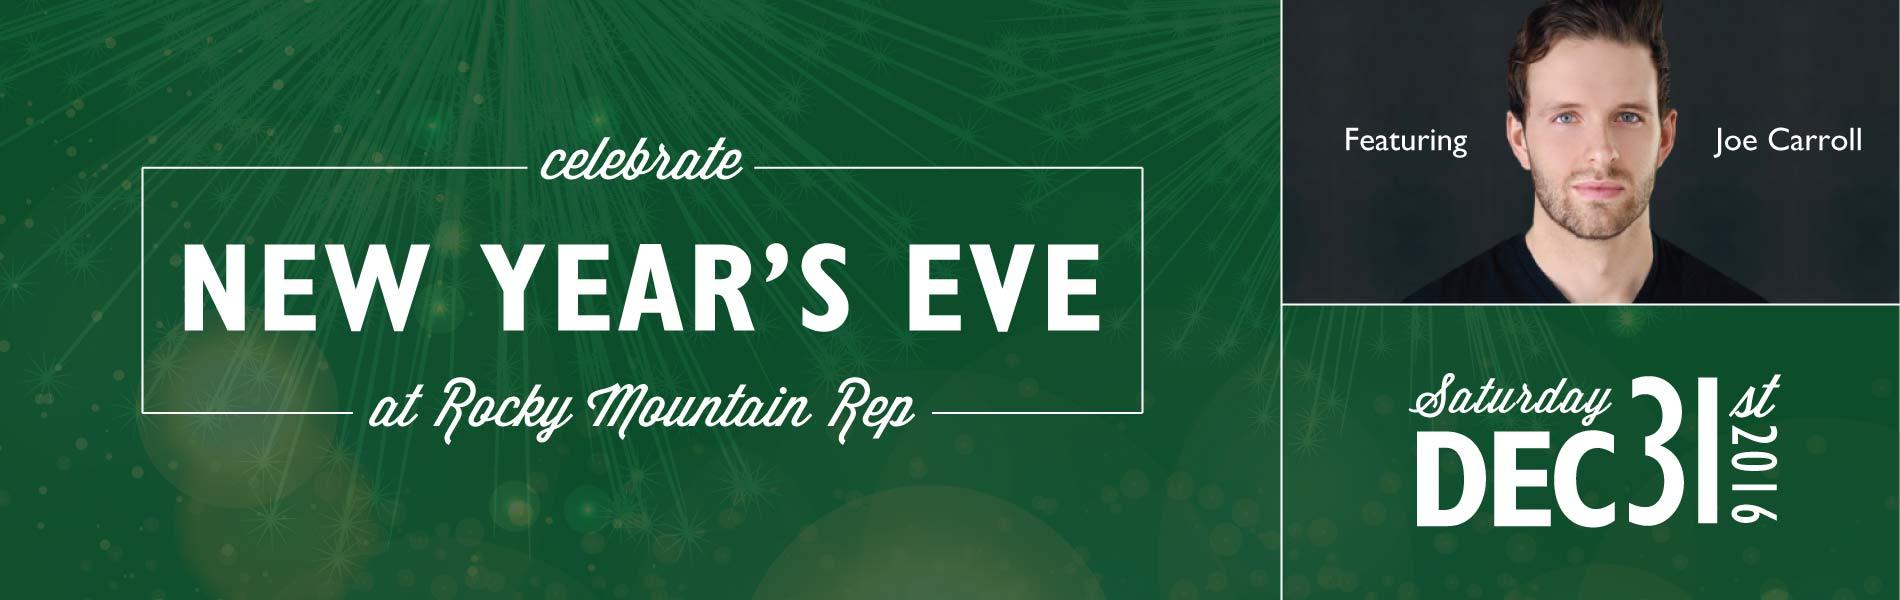 rmrt-new-year-eve-banner